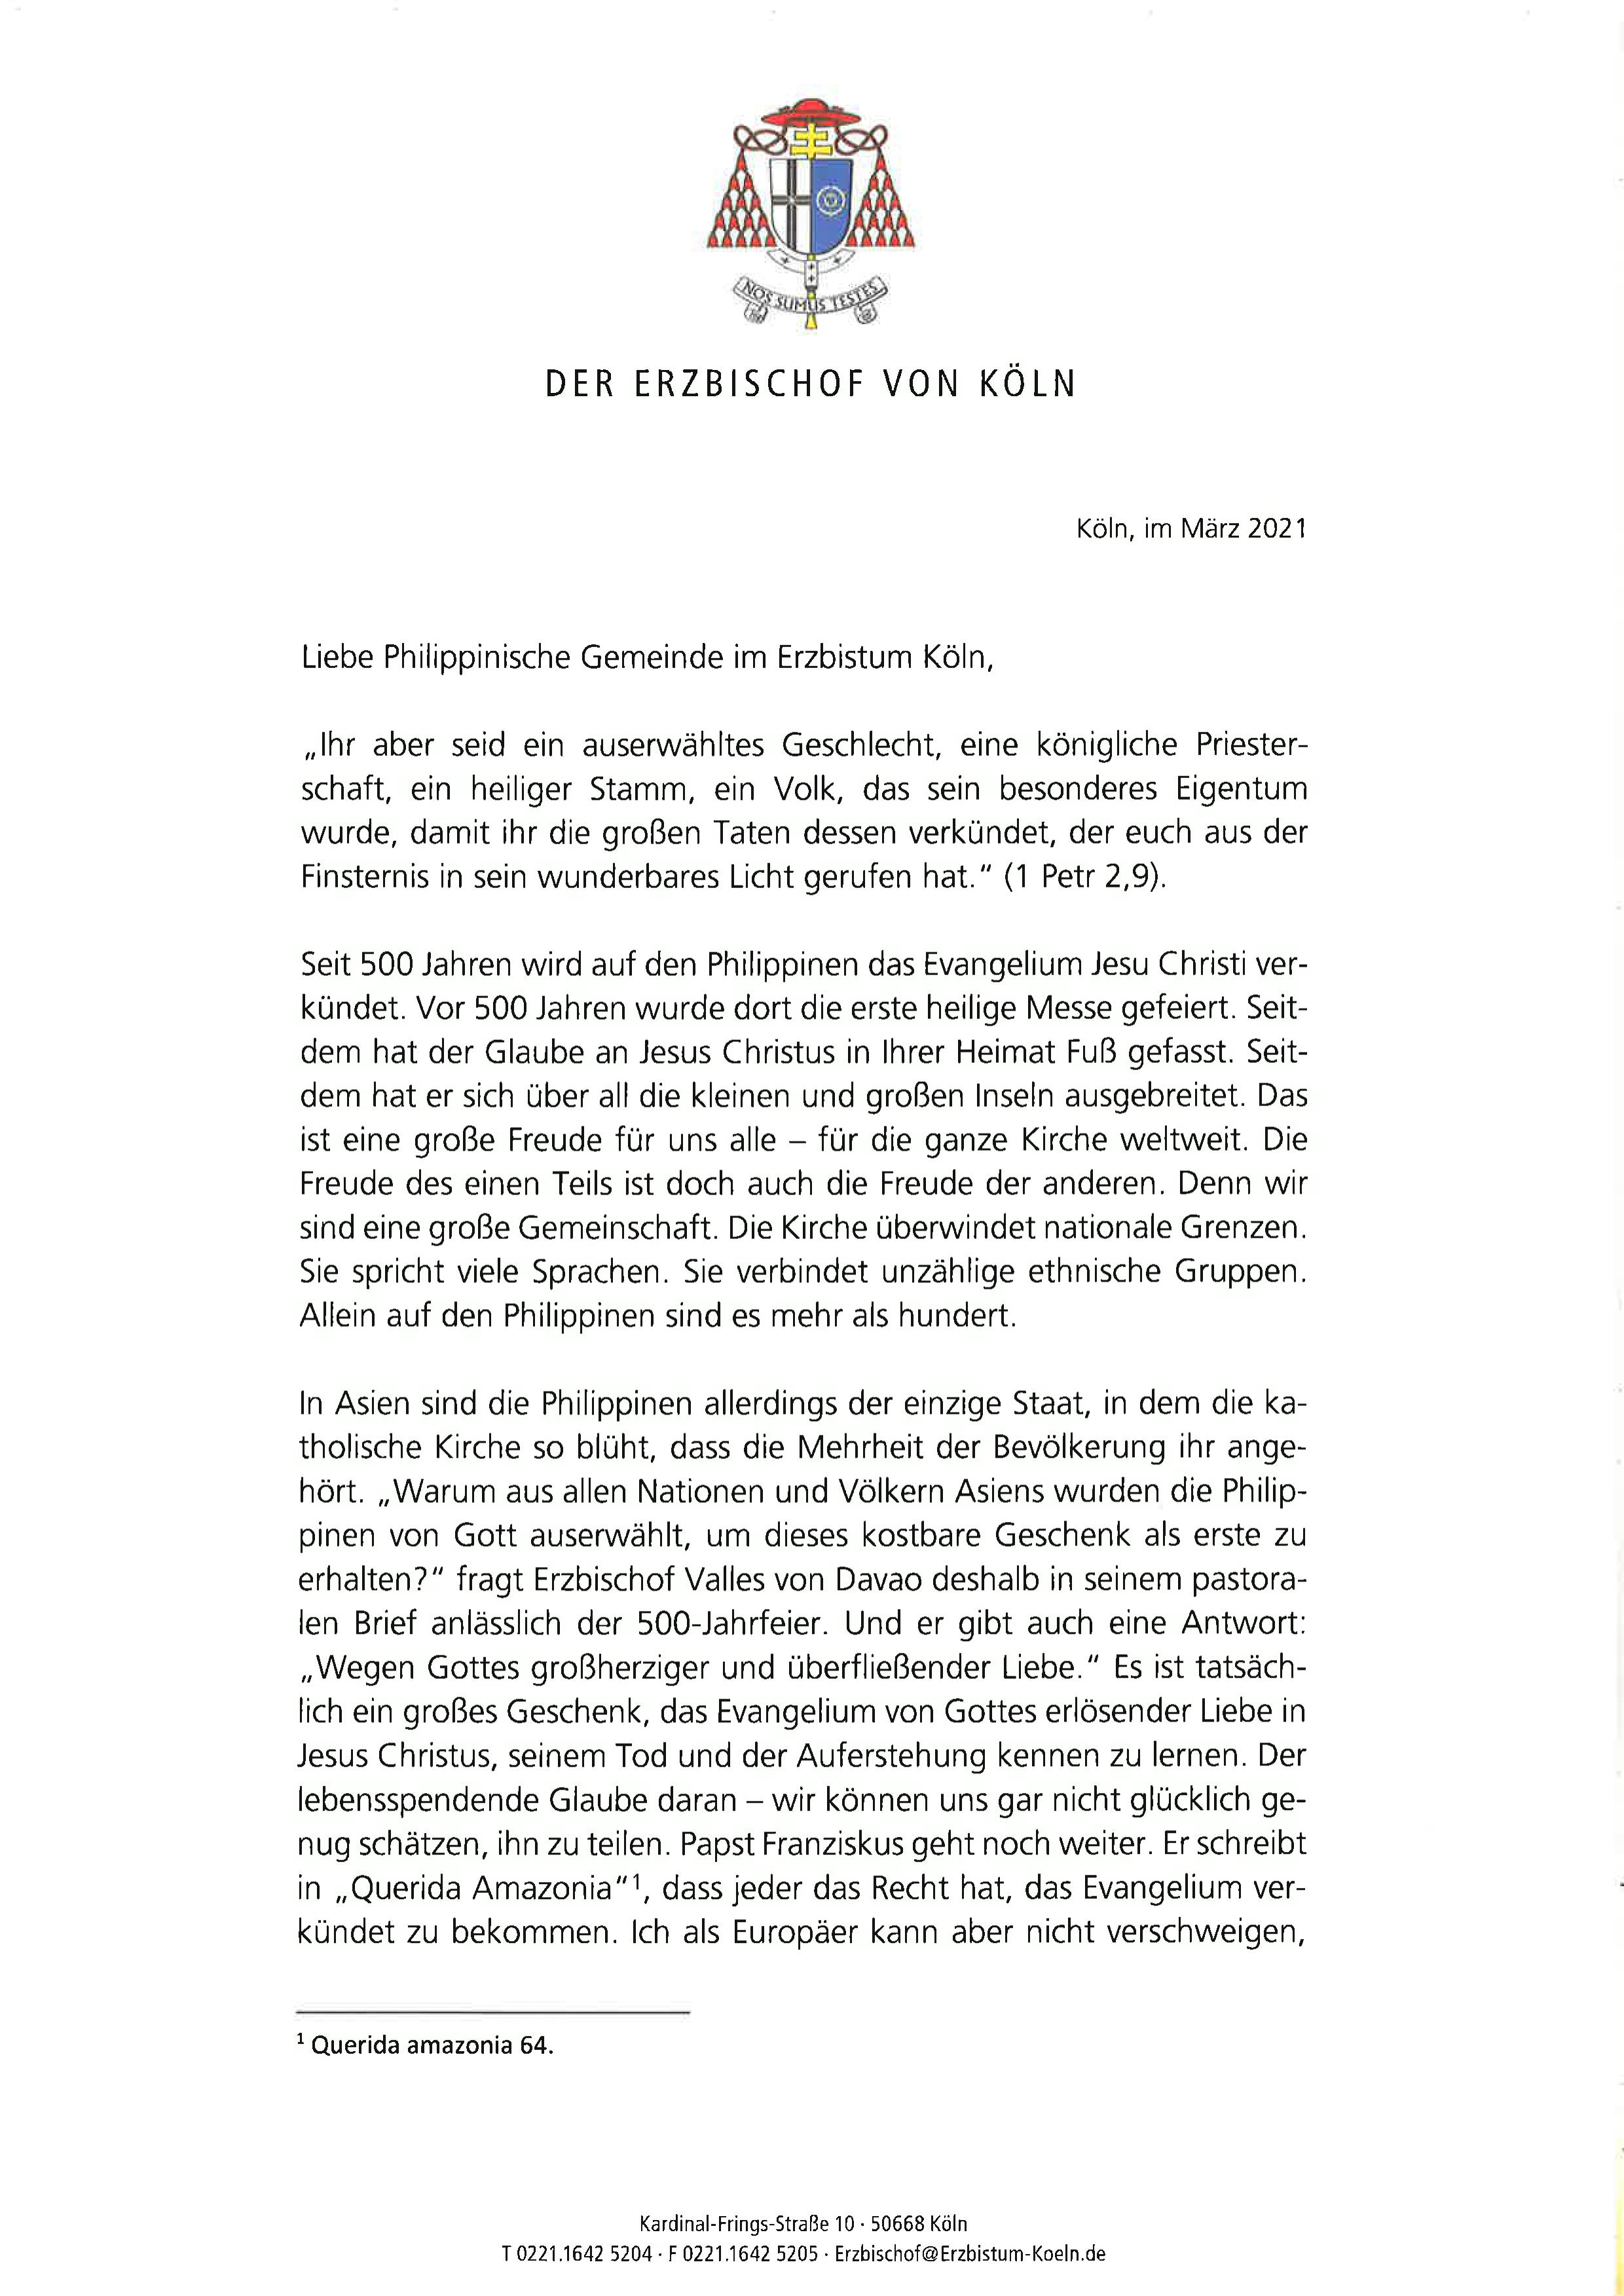 Grußwort Kardinal Rainer Maria Woelki_01